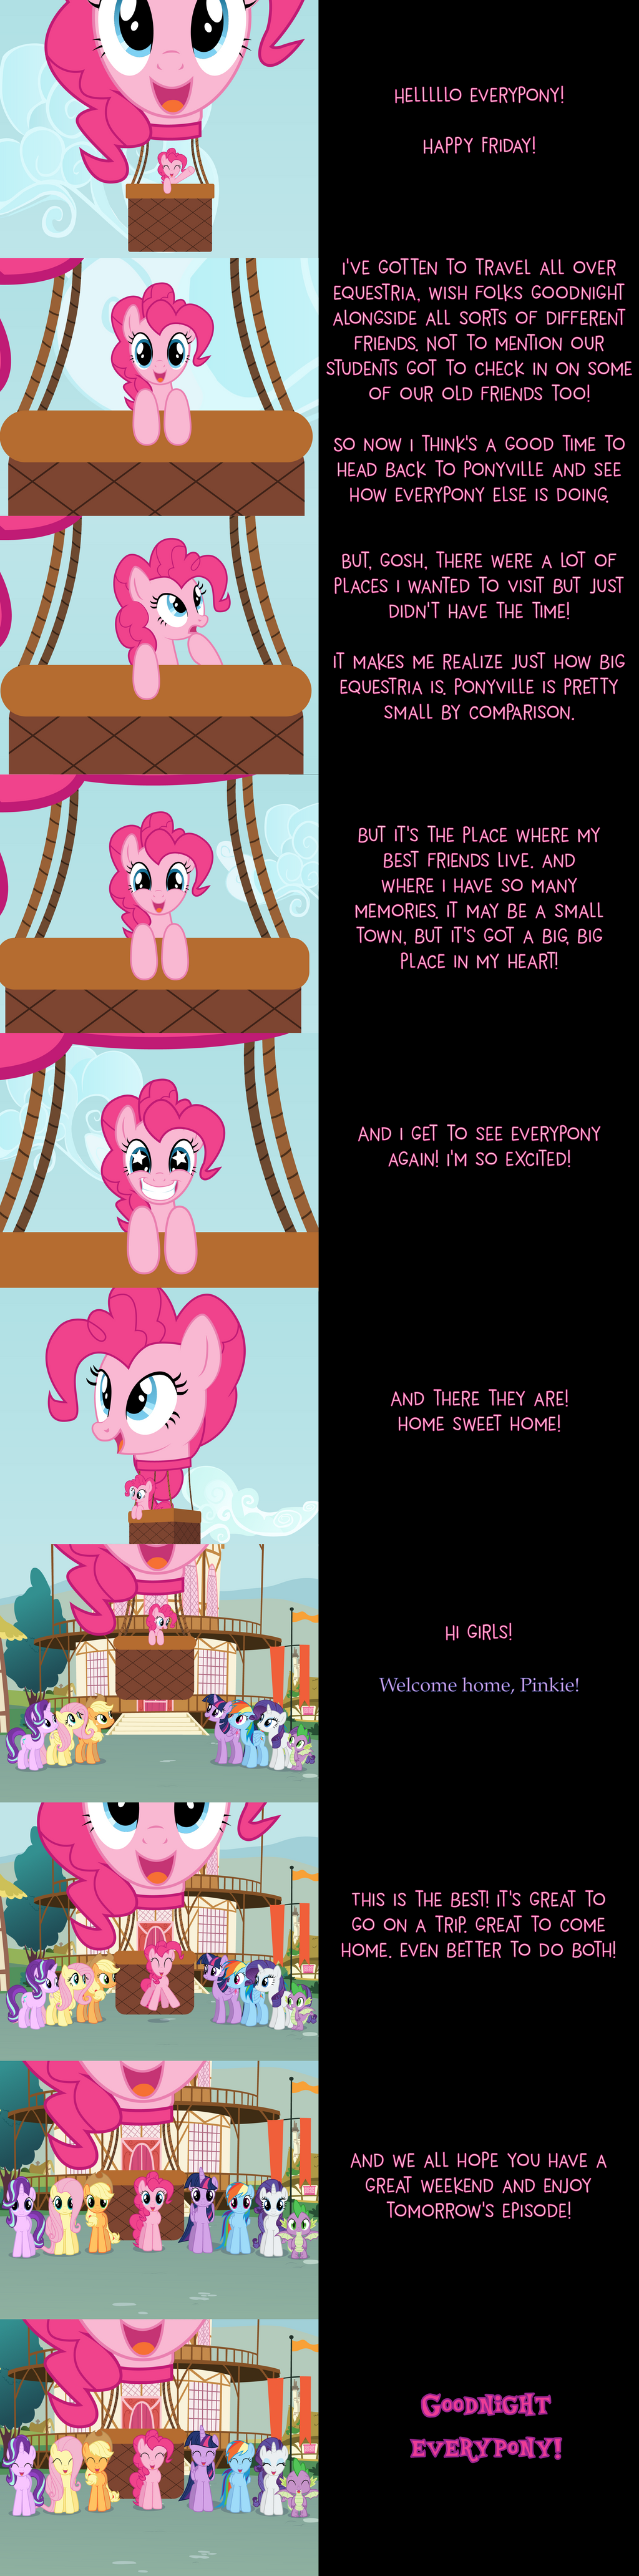 Pinkie Pie Says Goodnight: Homeward Bound